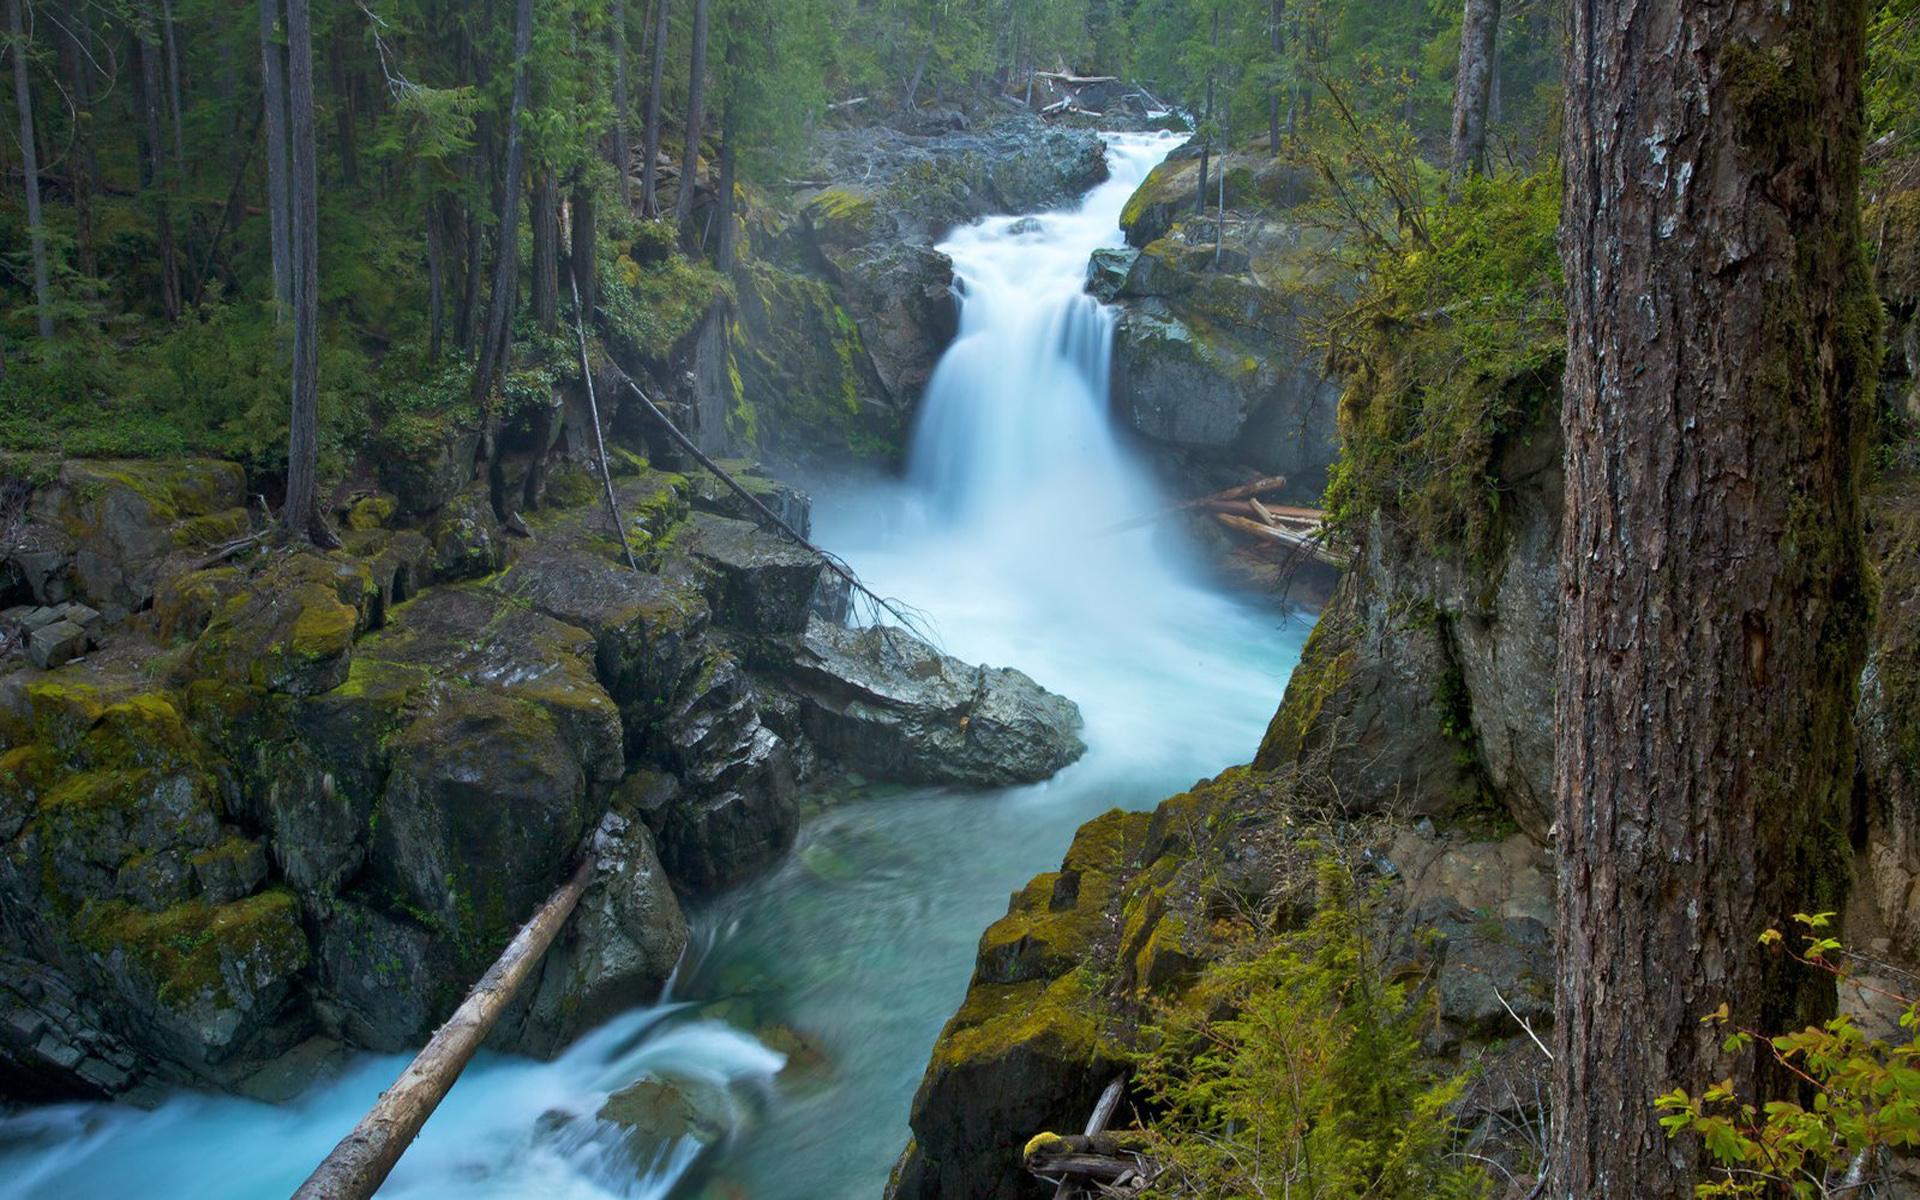 Hd Niagara Falls Wallpaper Mount Rainier National Park Usa Silver Falls Ohanpecosh